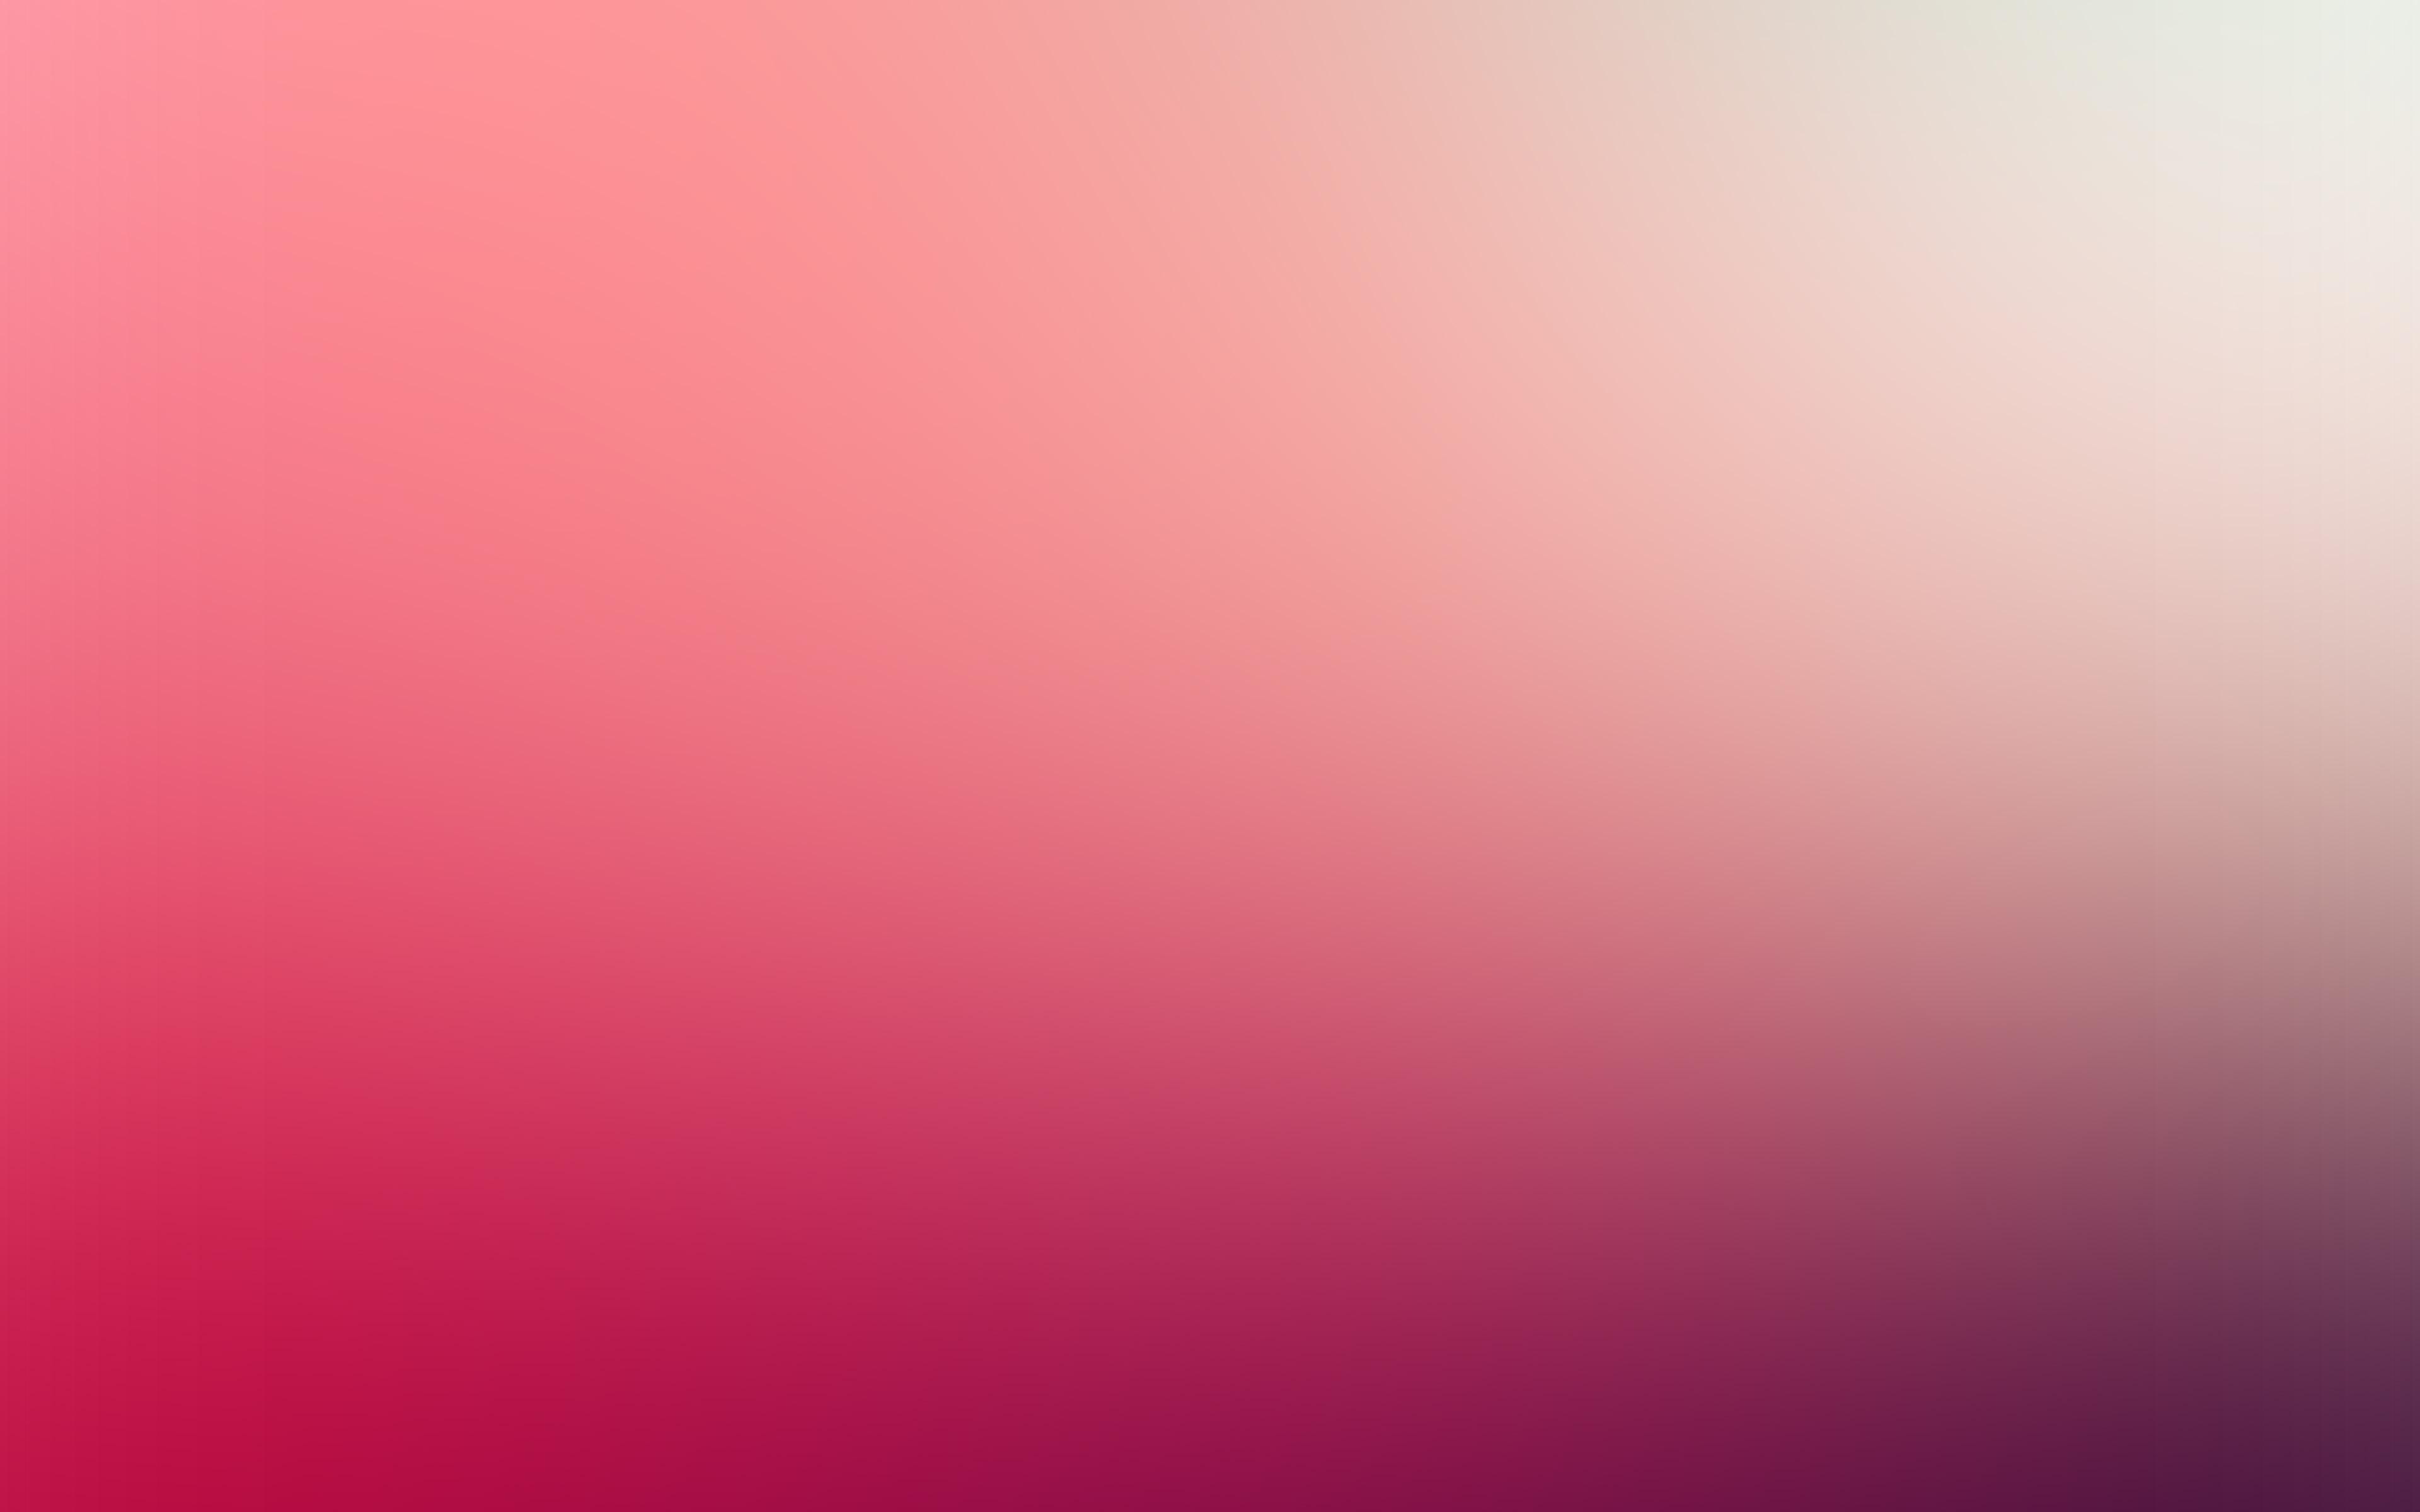 sl71-red-purple-blur-gradation-wallpaper